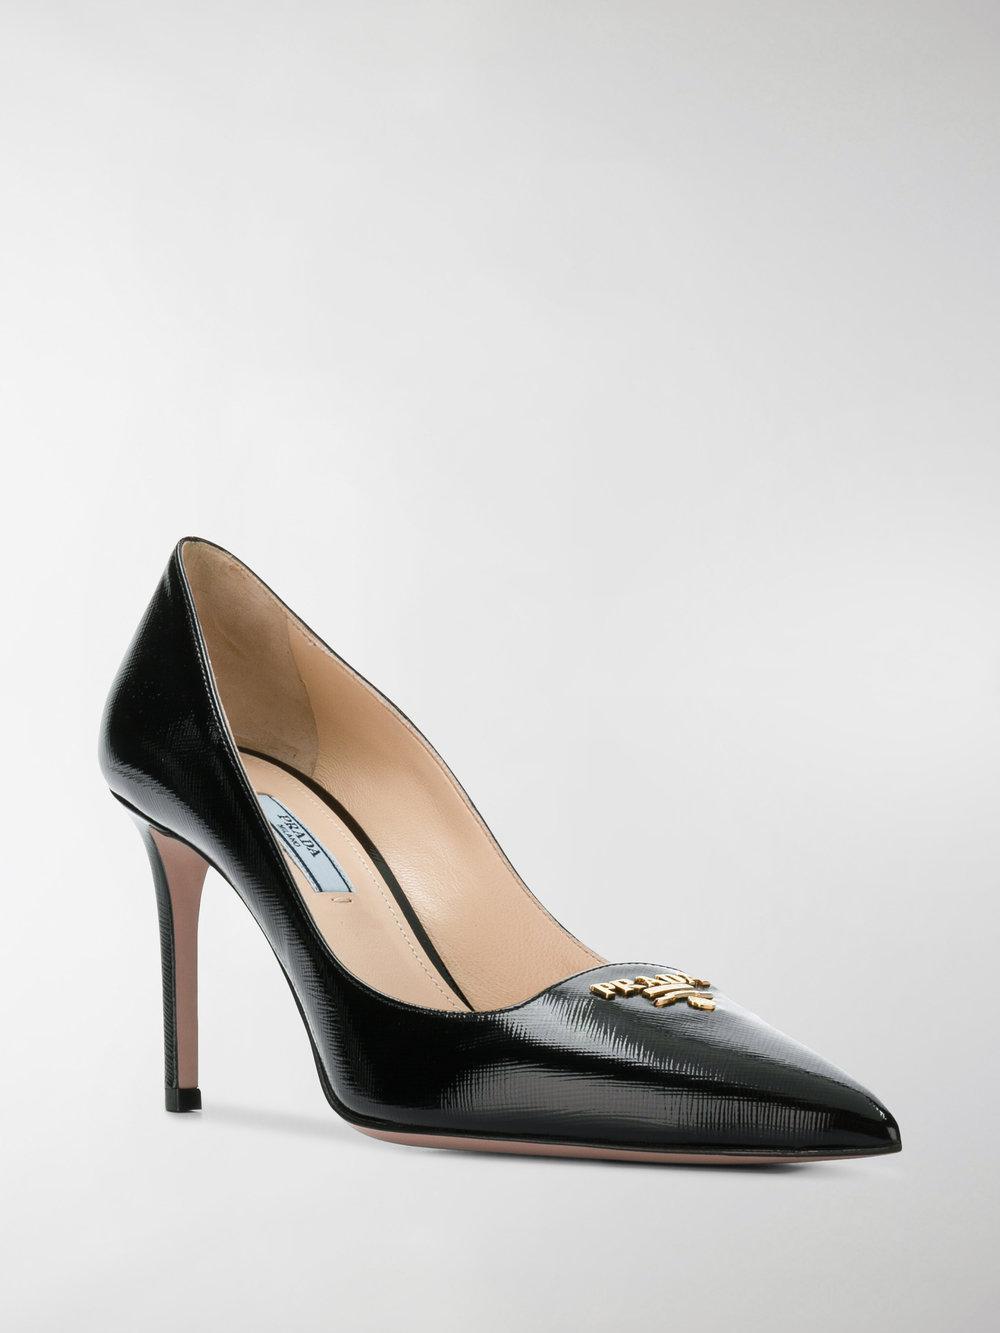 Prada Saffiano Textured Patent Leather